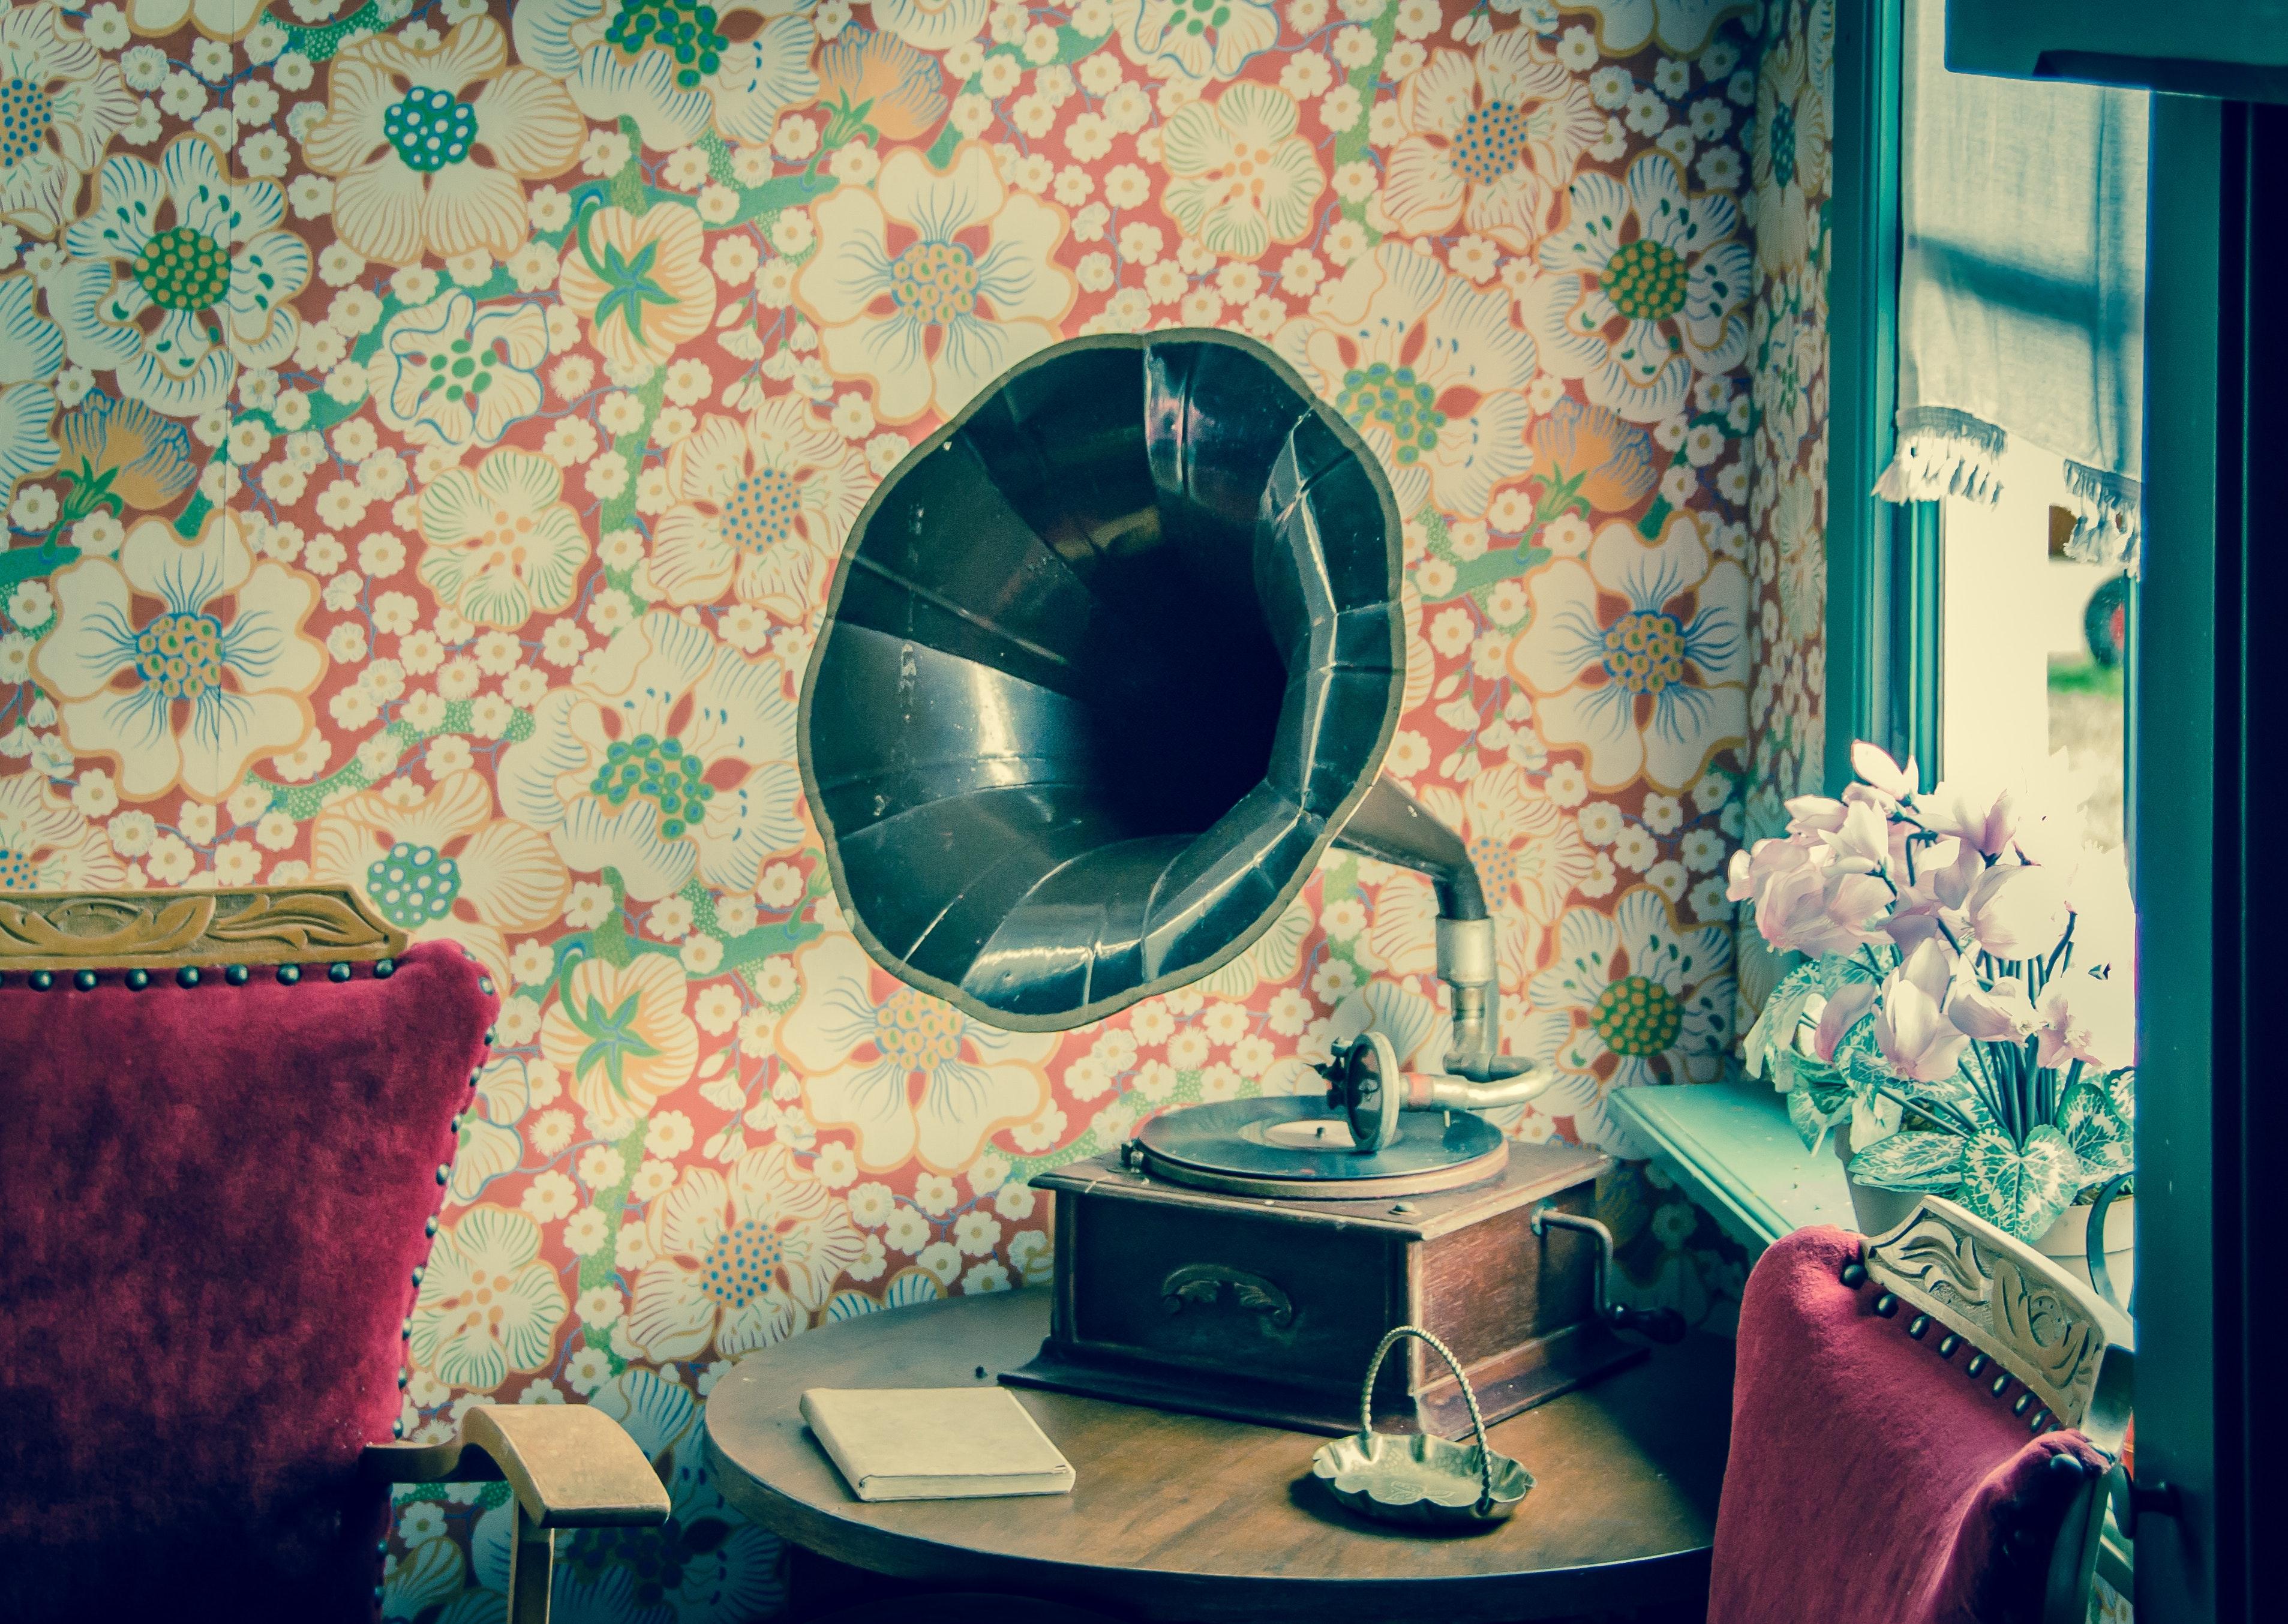 Brown and Black Gramophone, Antique, Lamp, Vinyl, Vintage, HQ Photo